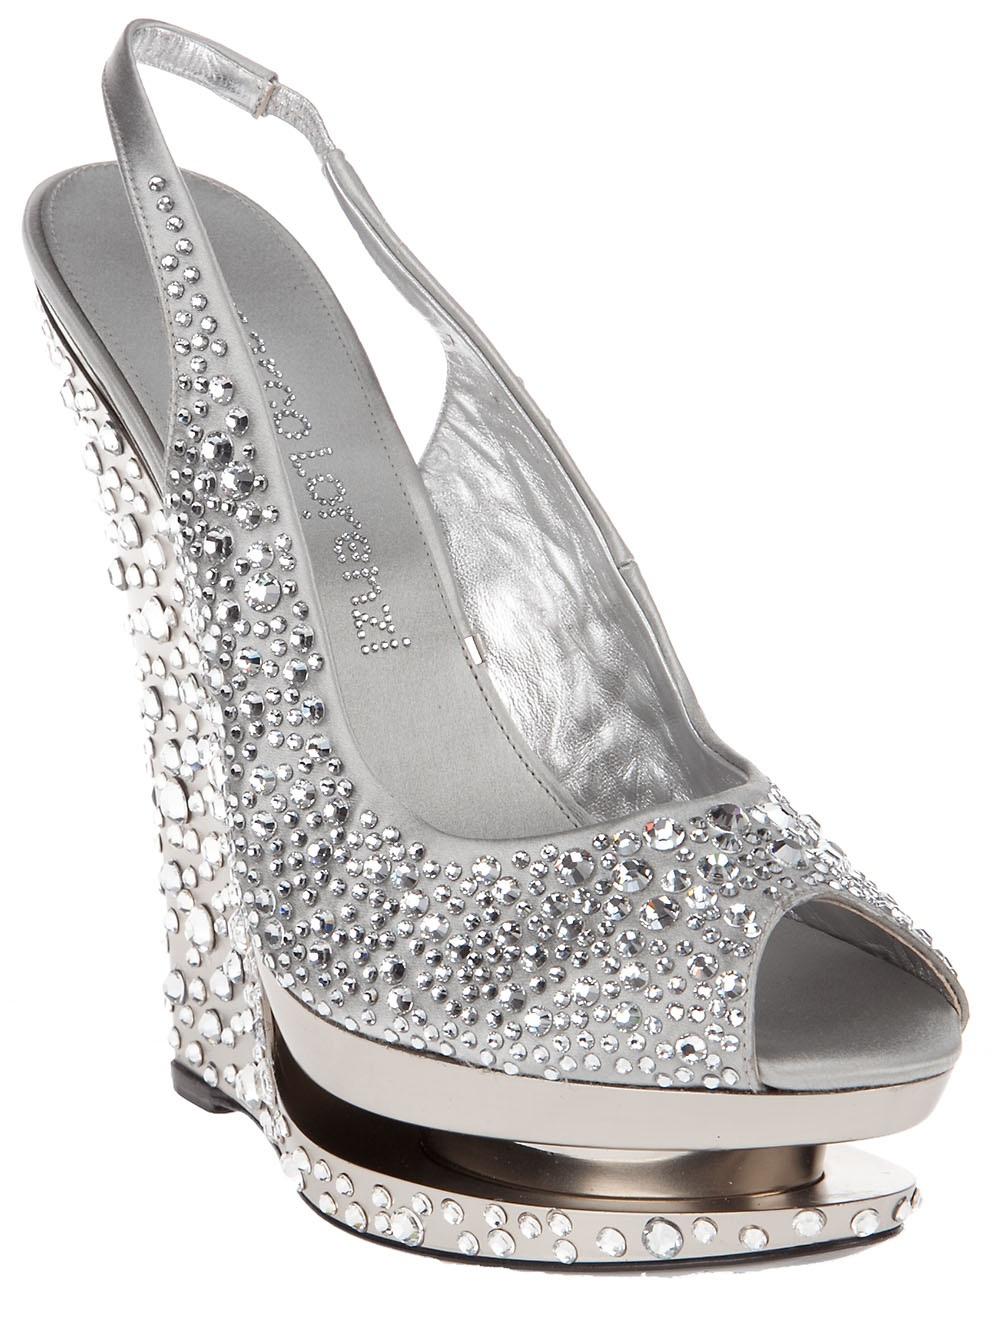 Lyst Gianmarco Lorenzi Crystal Wedge Shoe In Gray